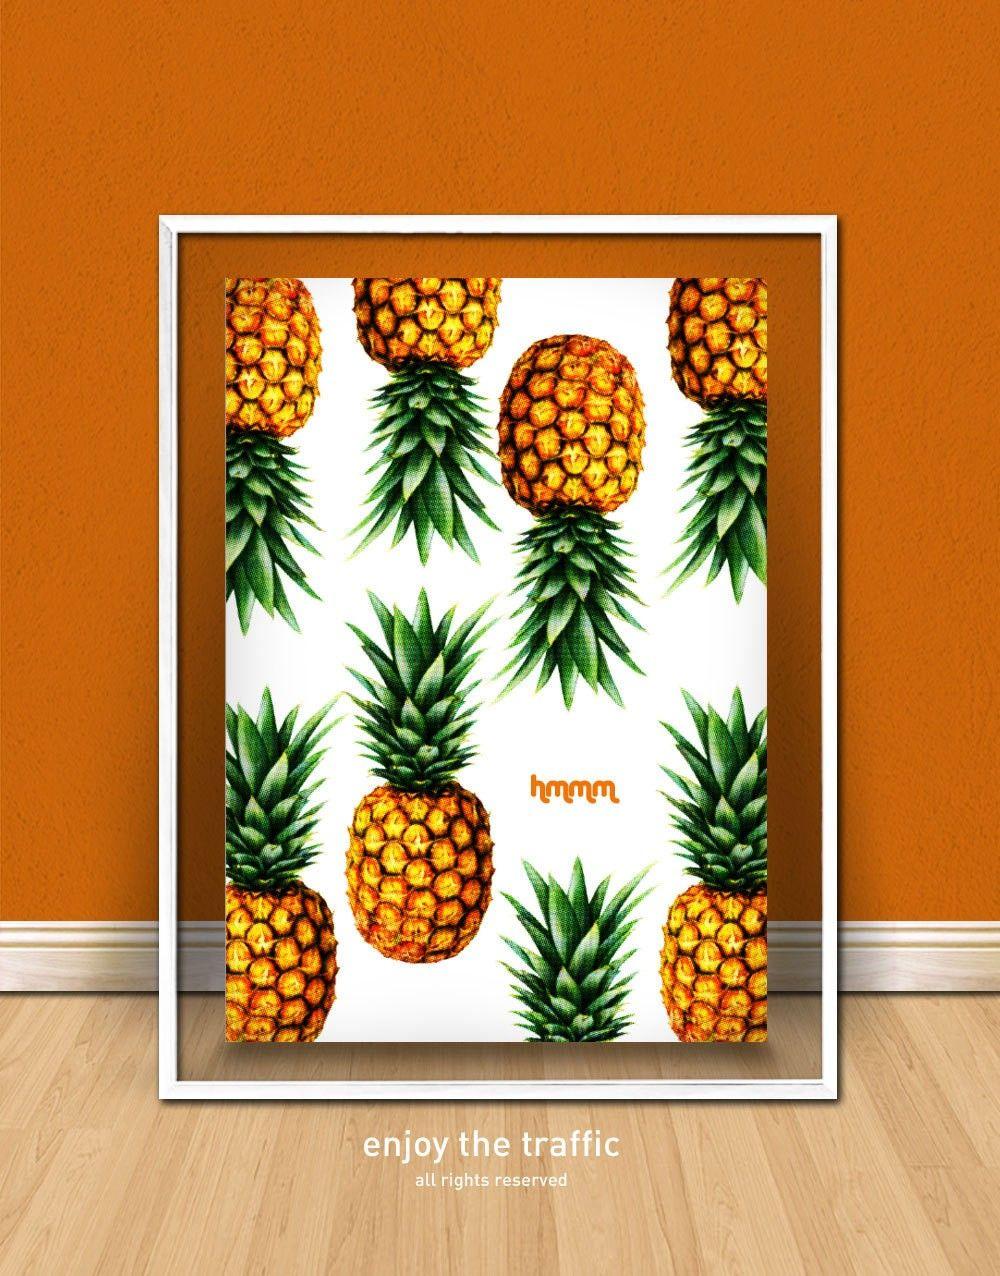 2017 Wall Decor Ideas Fun Pinele Print Fruit Art Poster F52002 Jpg 1000 1276